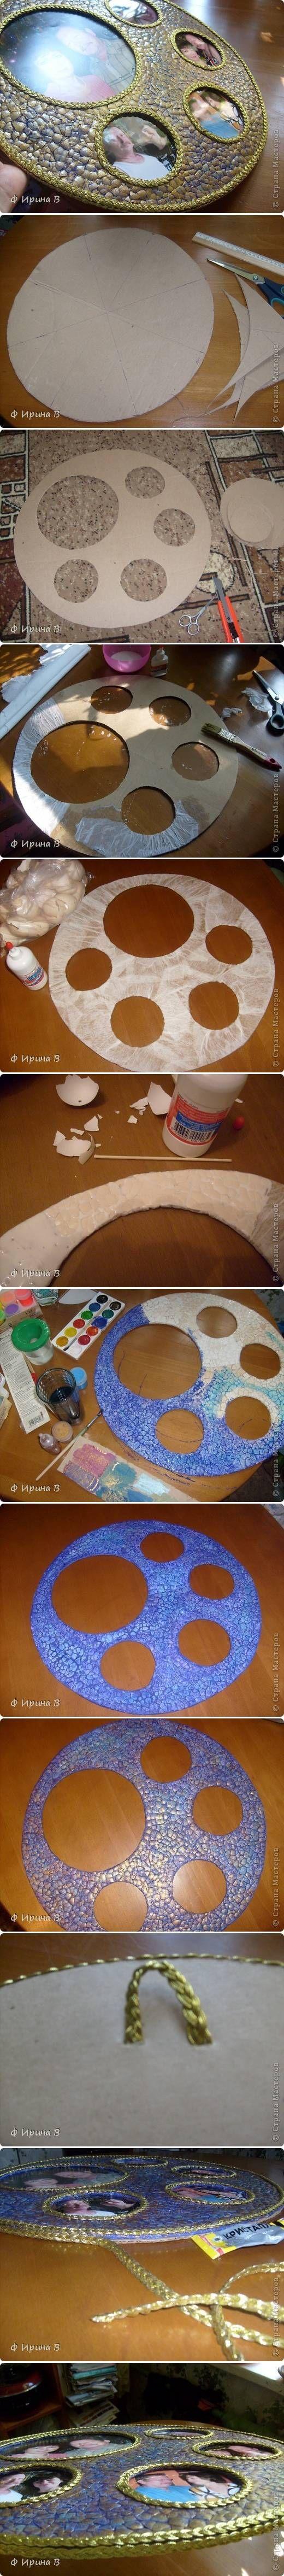 DIY Eggshell Panorama Frame DIY Projects | UsefulDIY.com Follow Us on Facebook ==> http://www.facebook.com/UsefulDiy